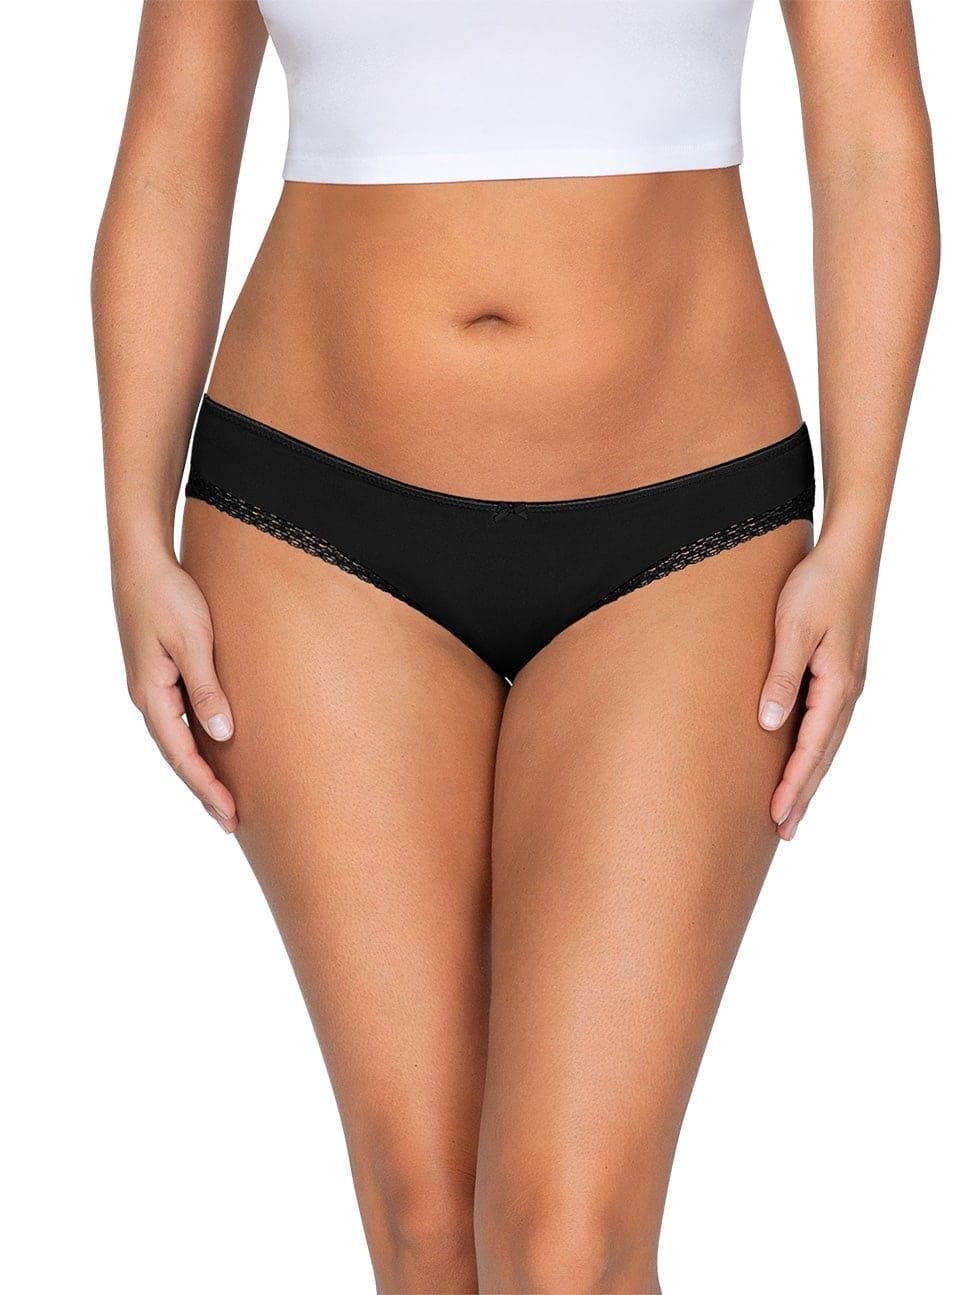 ParfaitPantyBikini PP301 A BlackFront main - Panty So Lovely Bikini Black PP301